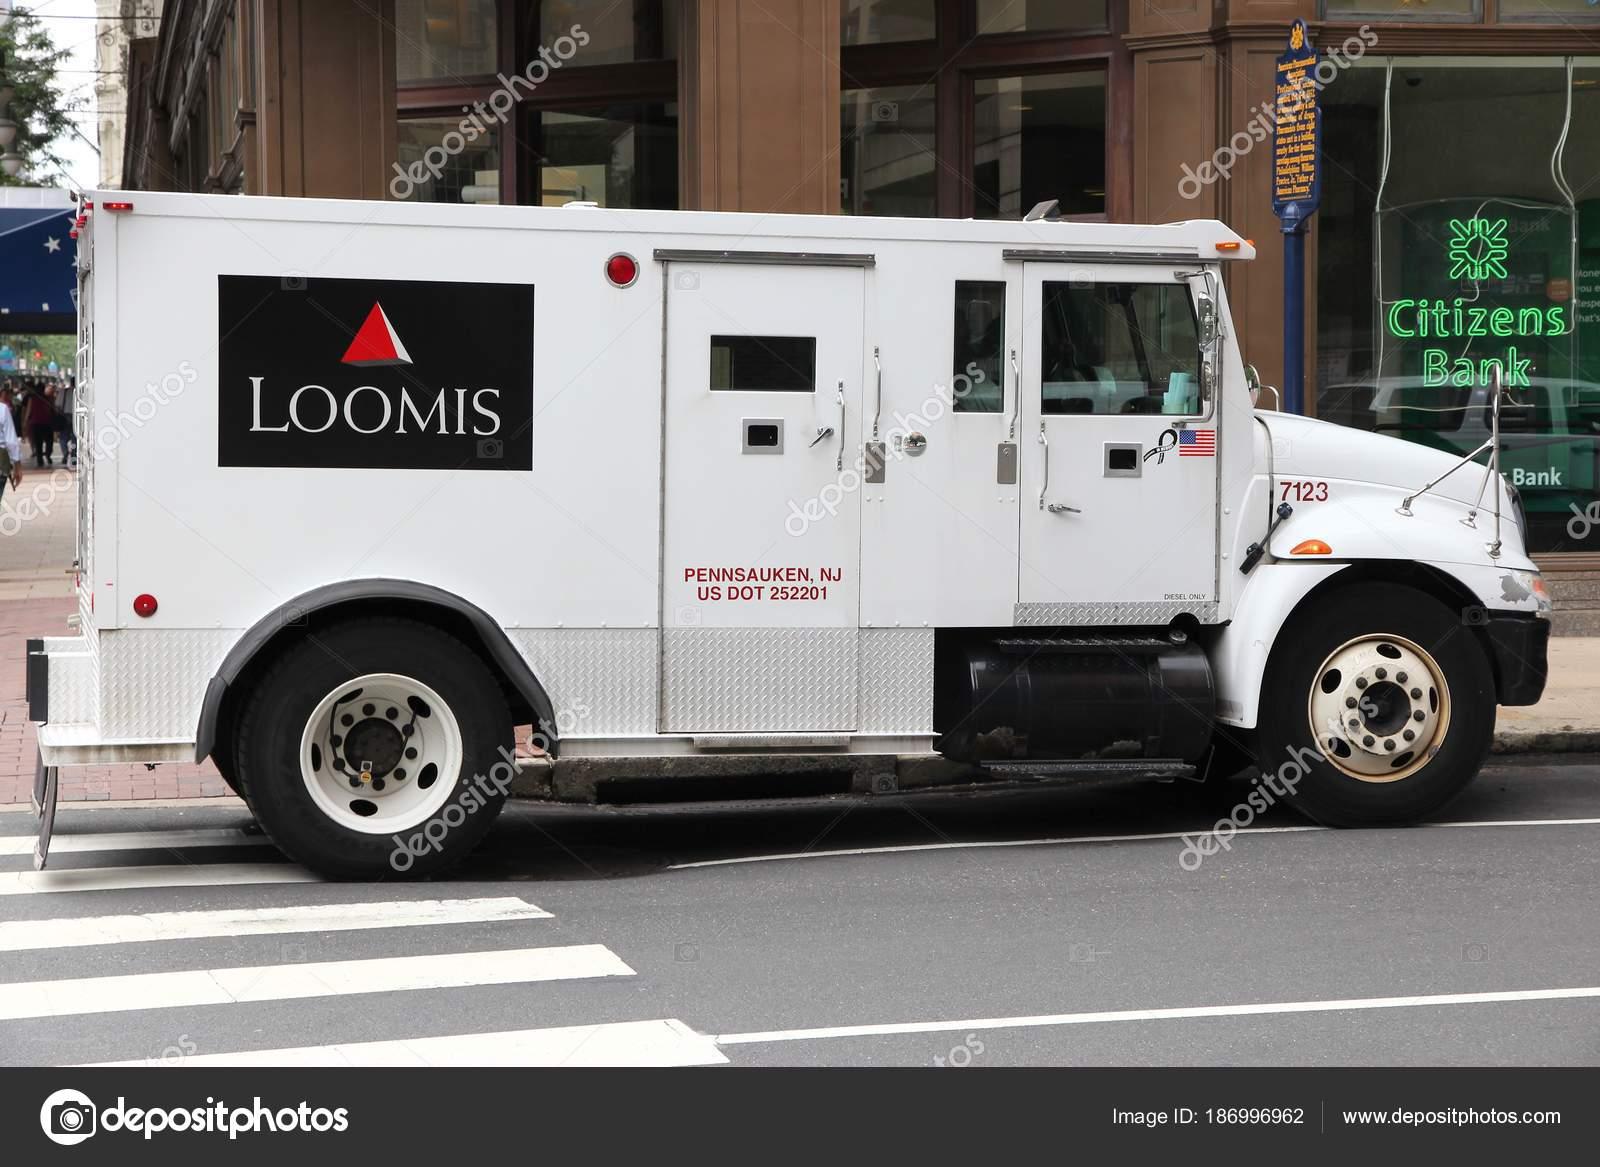 Loomis money truck – Stock Editorial Photo © tupungato #186996962